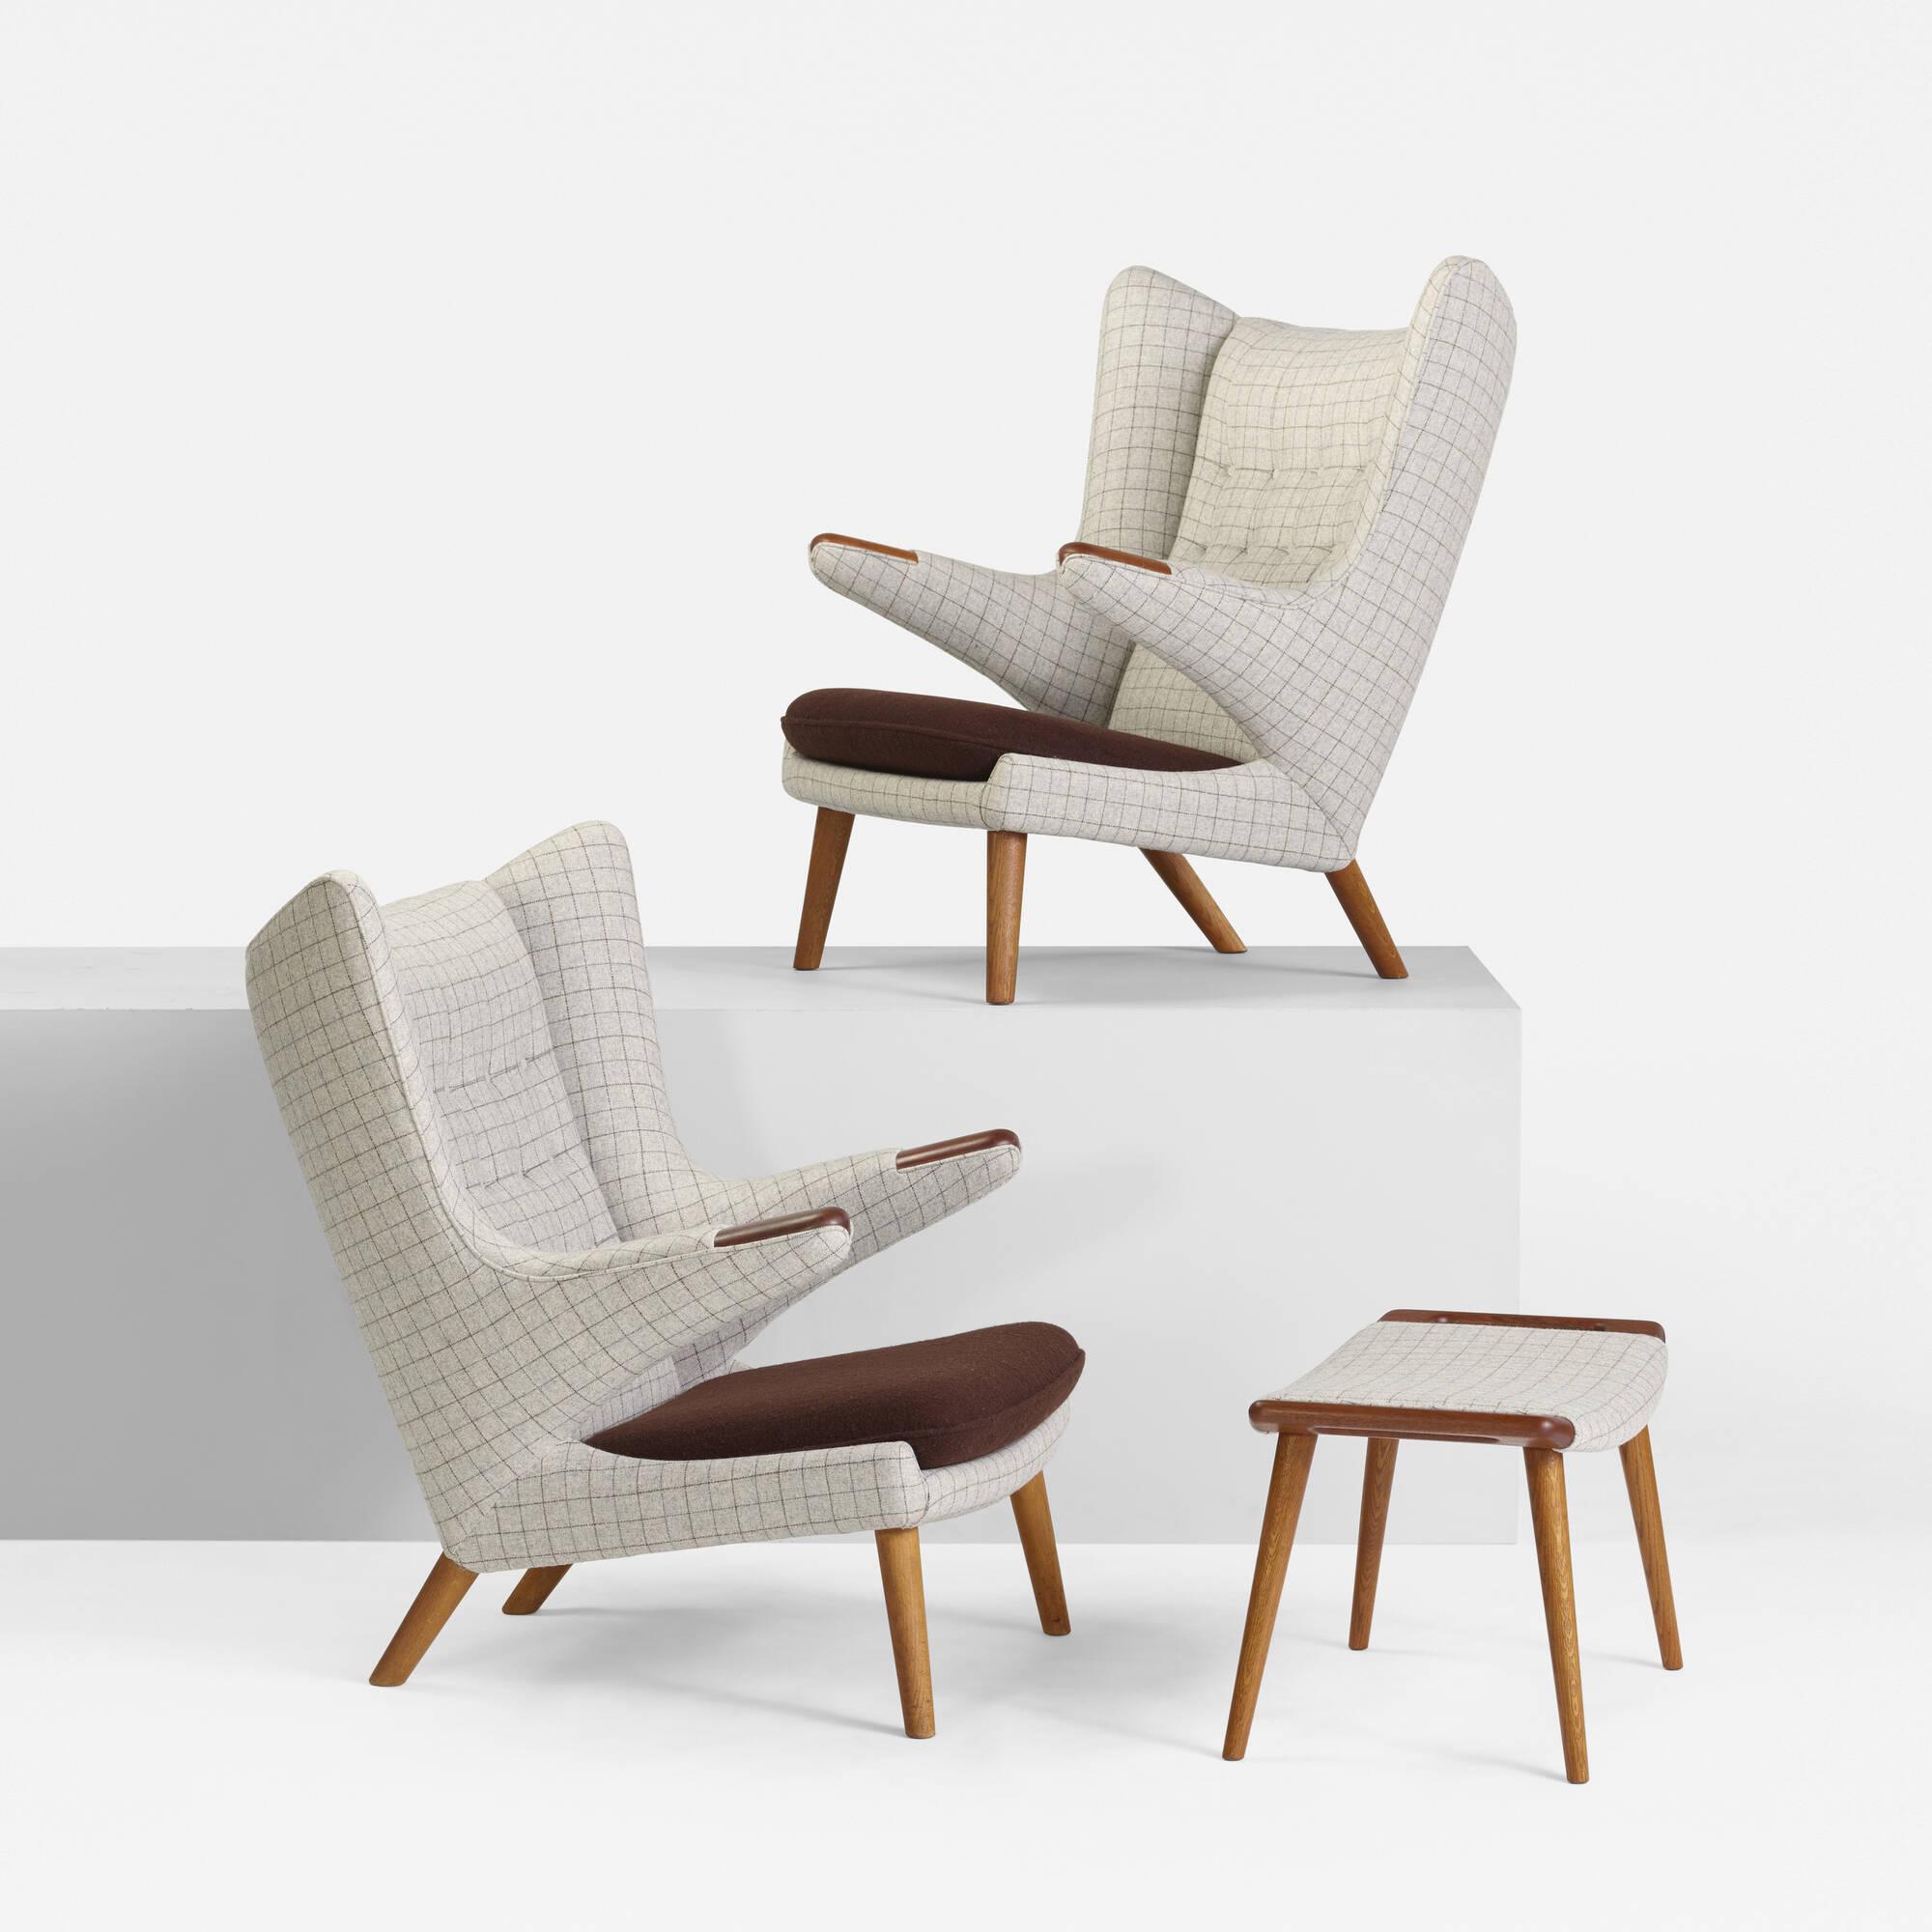 372 Hans J Wegner pair of Papa Bear chairs and ottoman